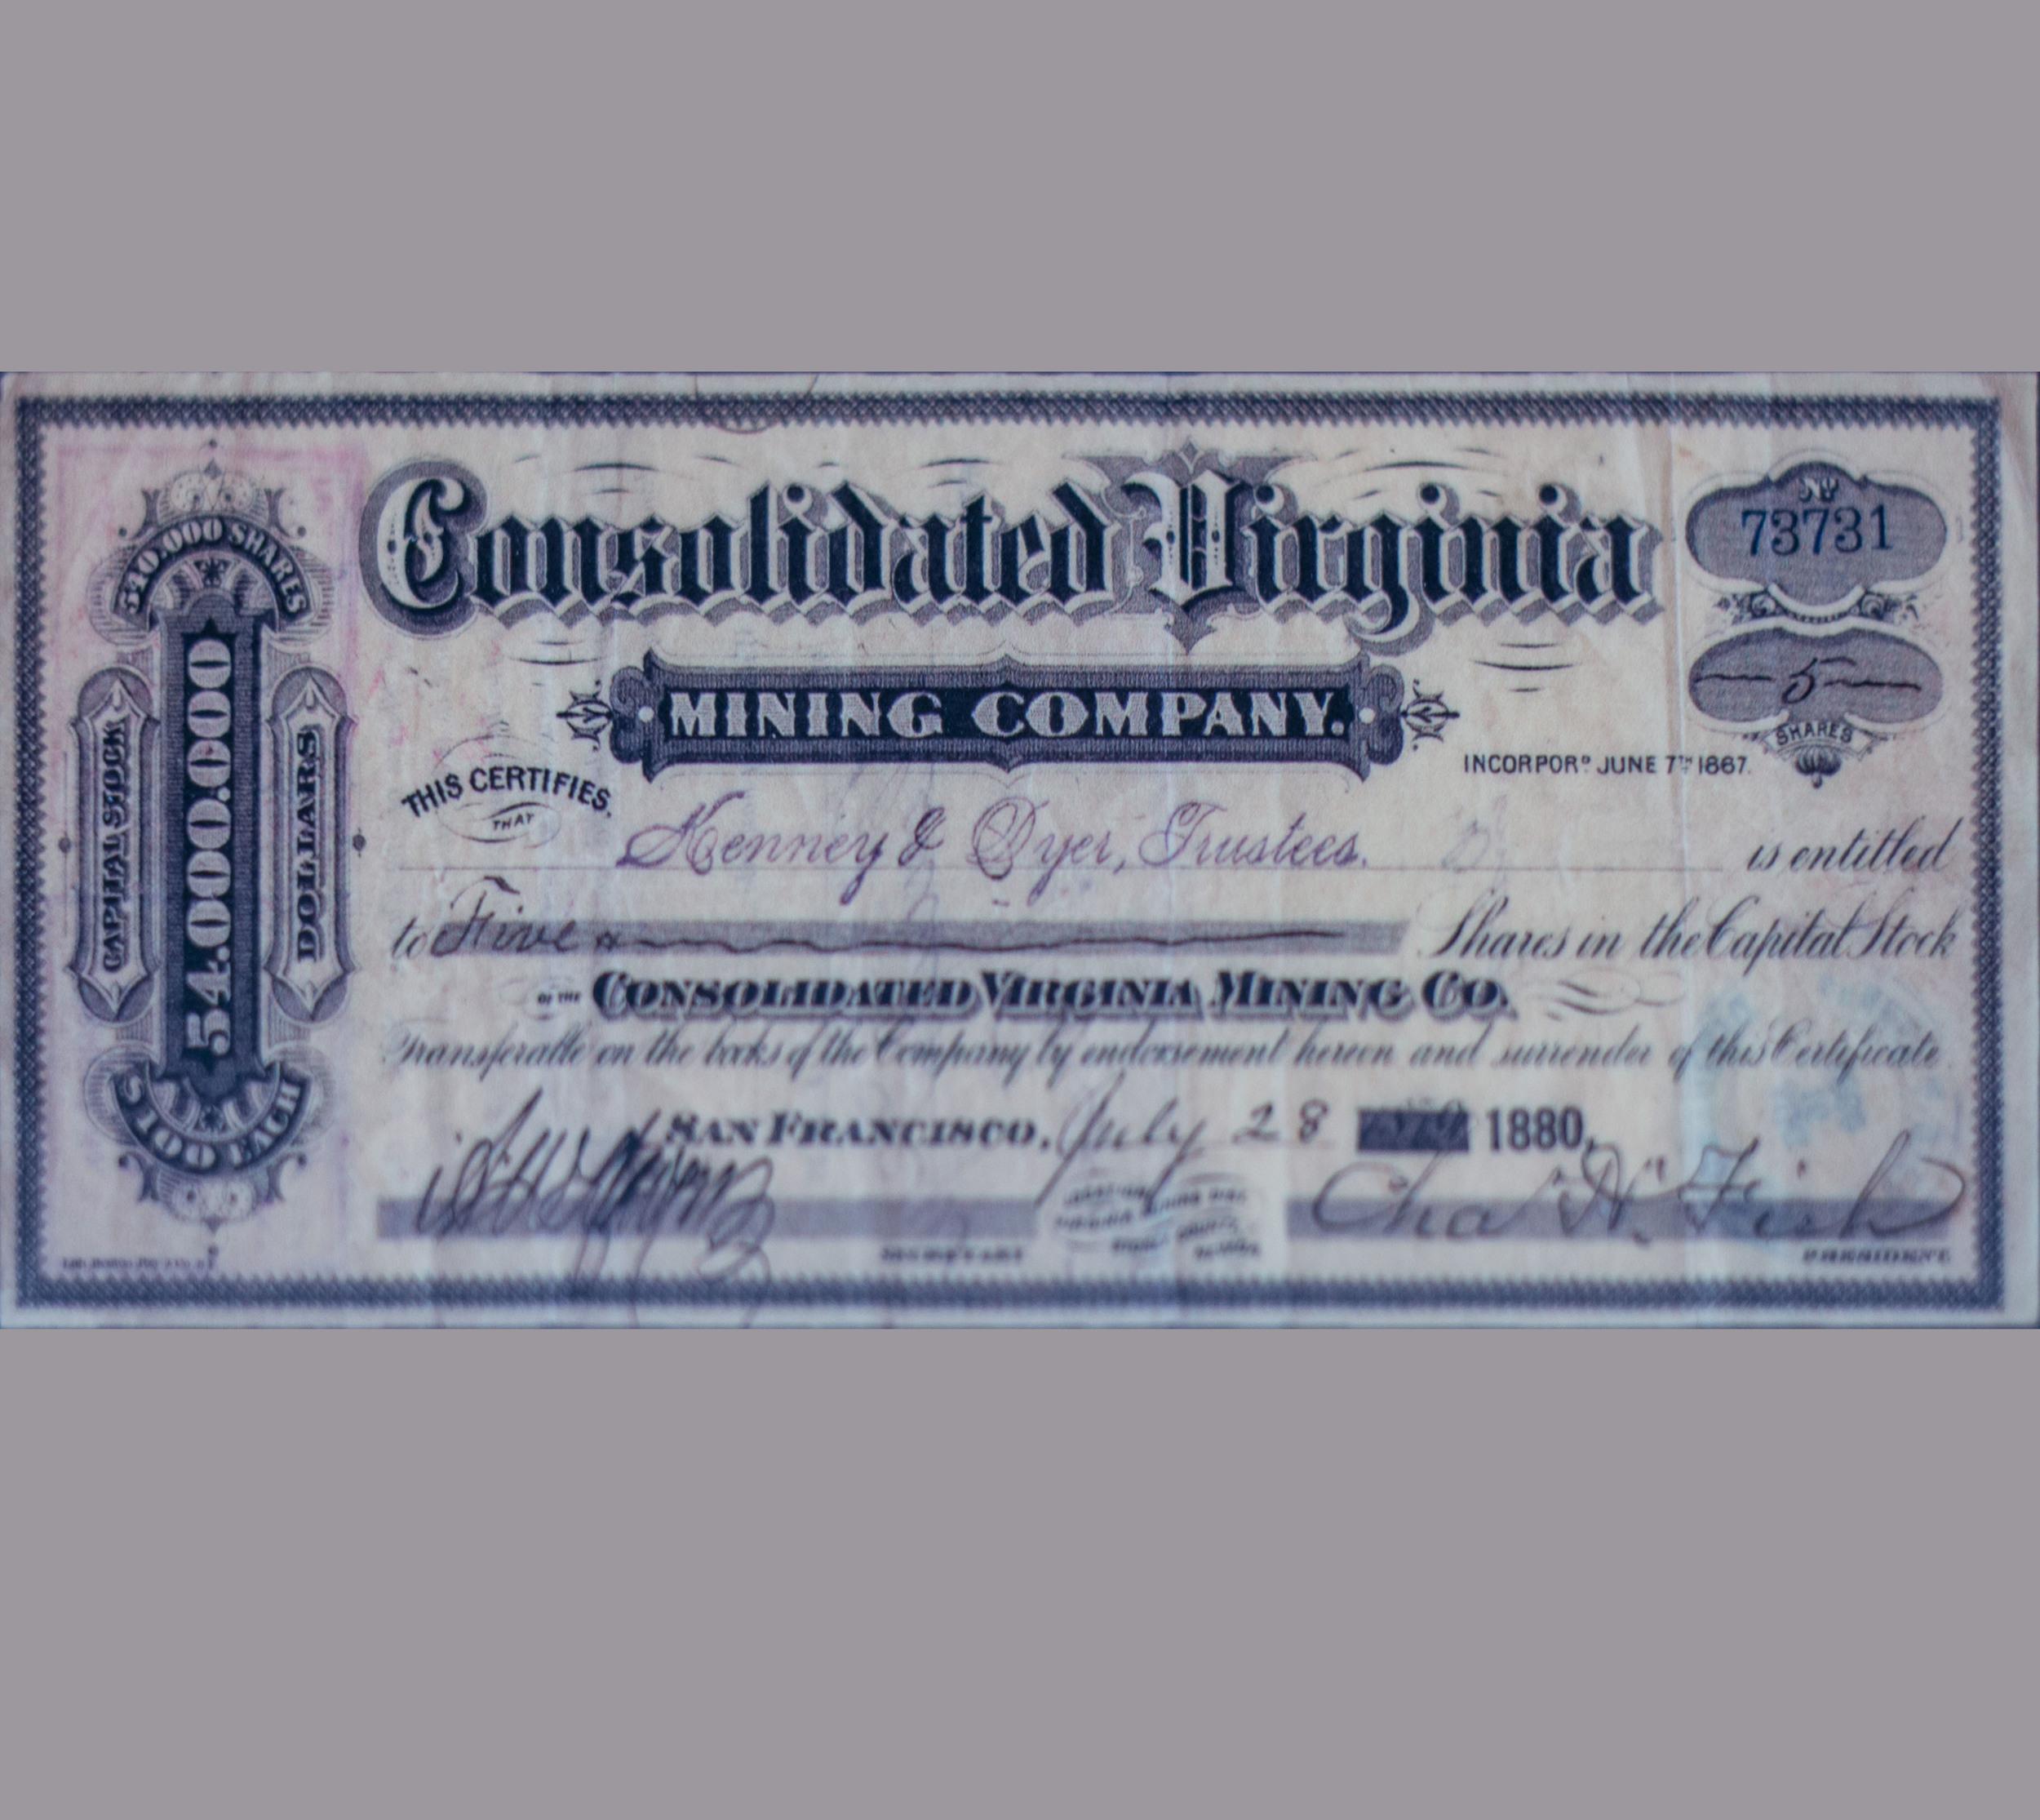 Consolidated Virginia Mining Company